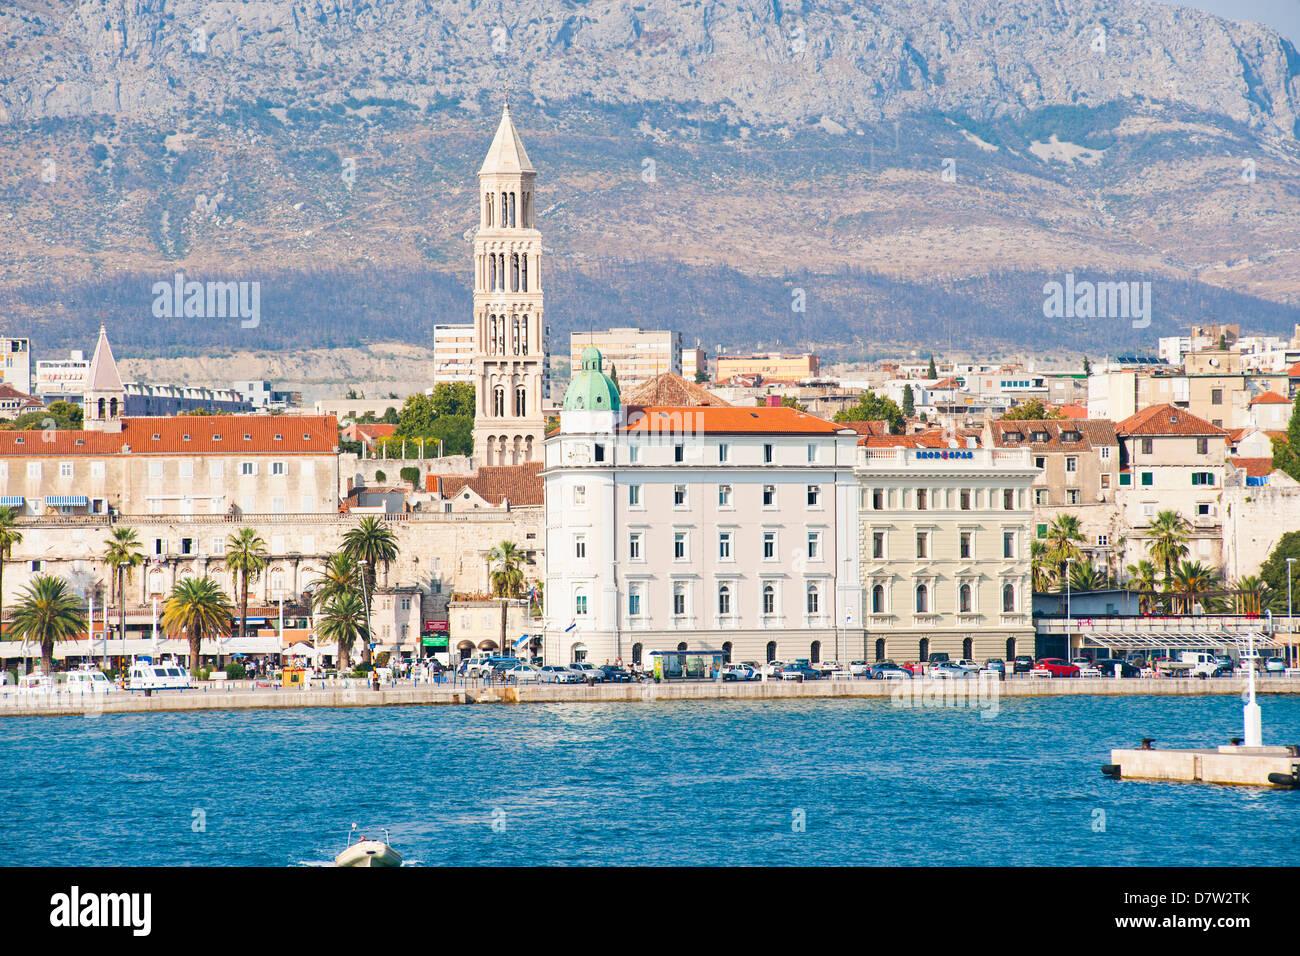 Cathedral of St. Domnius (Katedrala Svetog Duje) rising above Split, Dalmatian Coast, Adriatic, Croatia - Stock Image